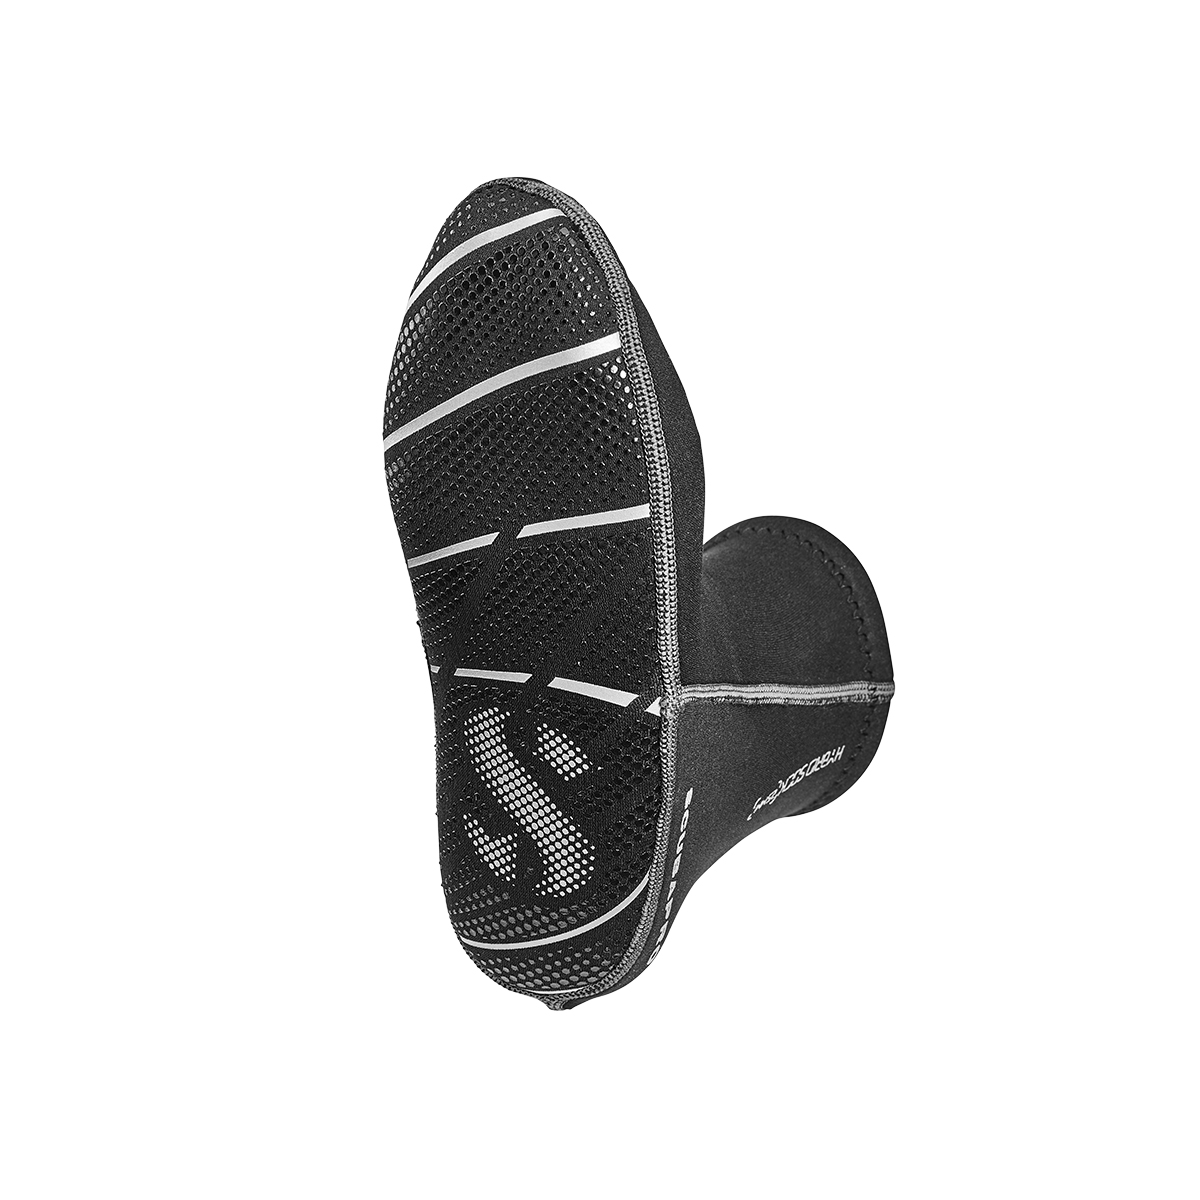 Неопренови чорапи HYBRID SOCK 2.5 / 2,5 мм - Scubapro